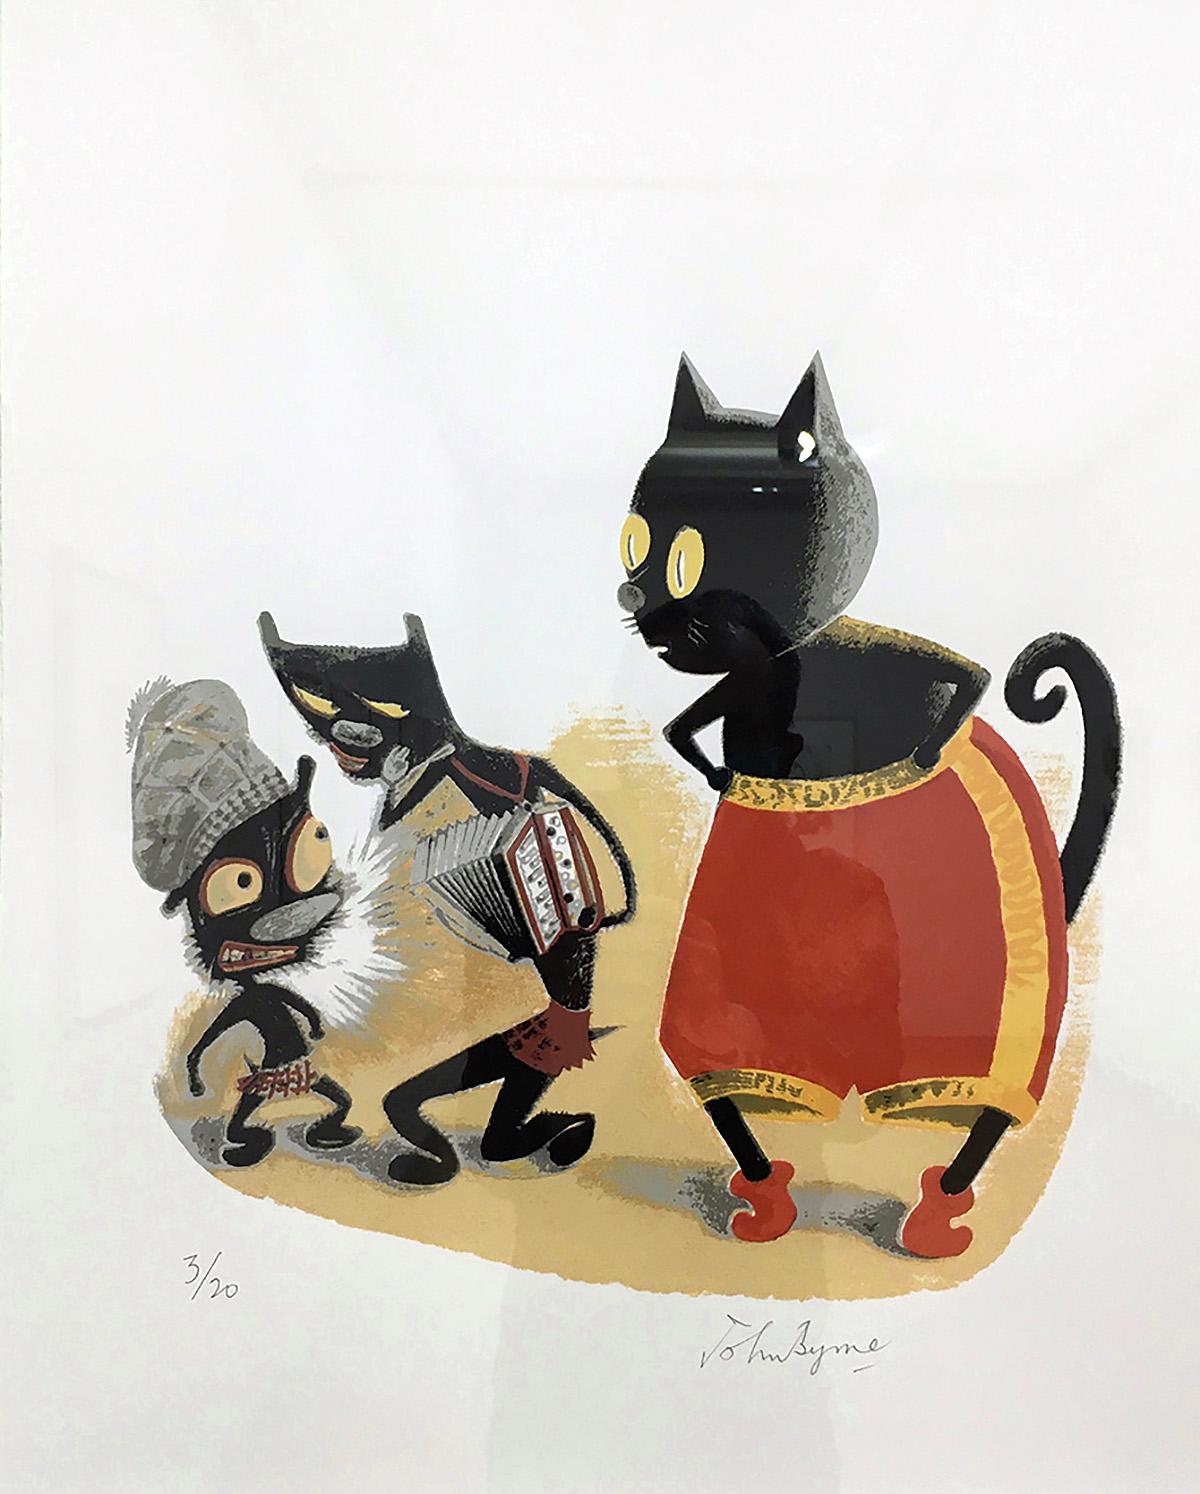 John Byrne, 'Three Cats', screenprint.jpg